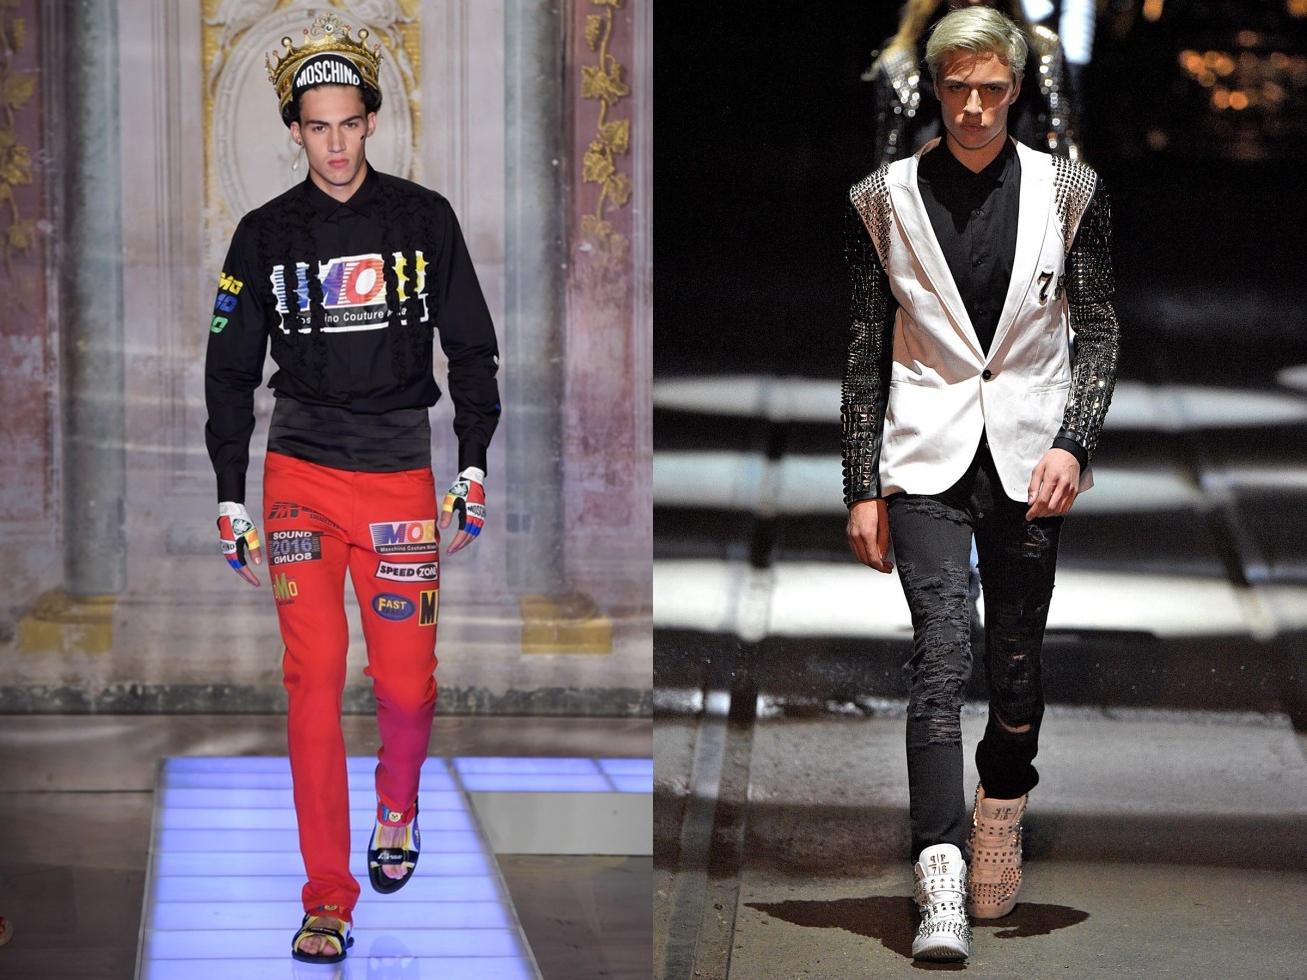 tendencia masculina, moda masculina, menswear, fashion blogger, blogueiro de moda, milan fashion week, trends, verão 2016, summer 2016, alex cursino, moda sem censura, 6